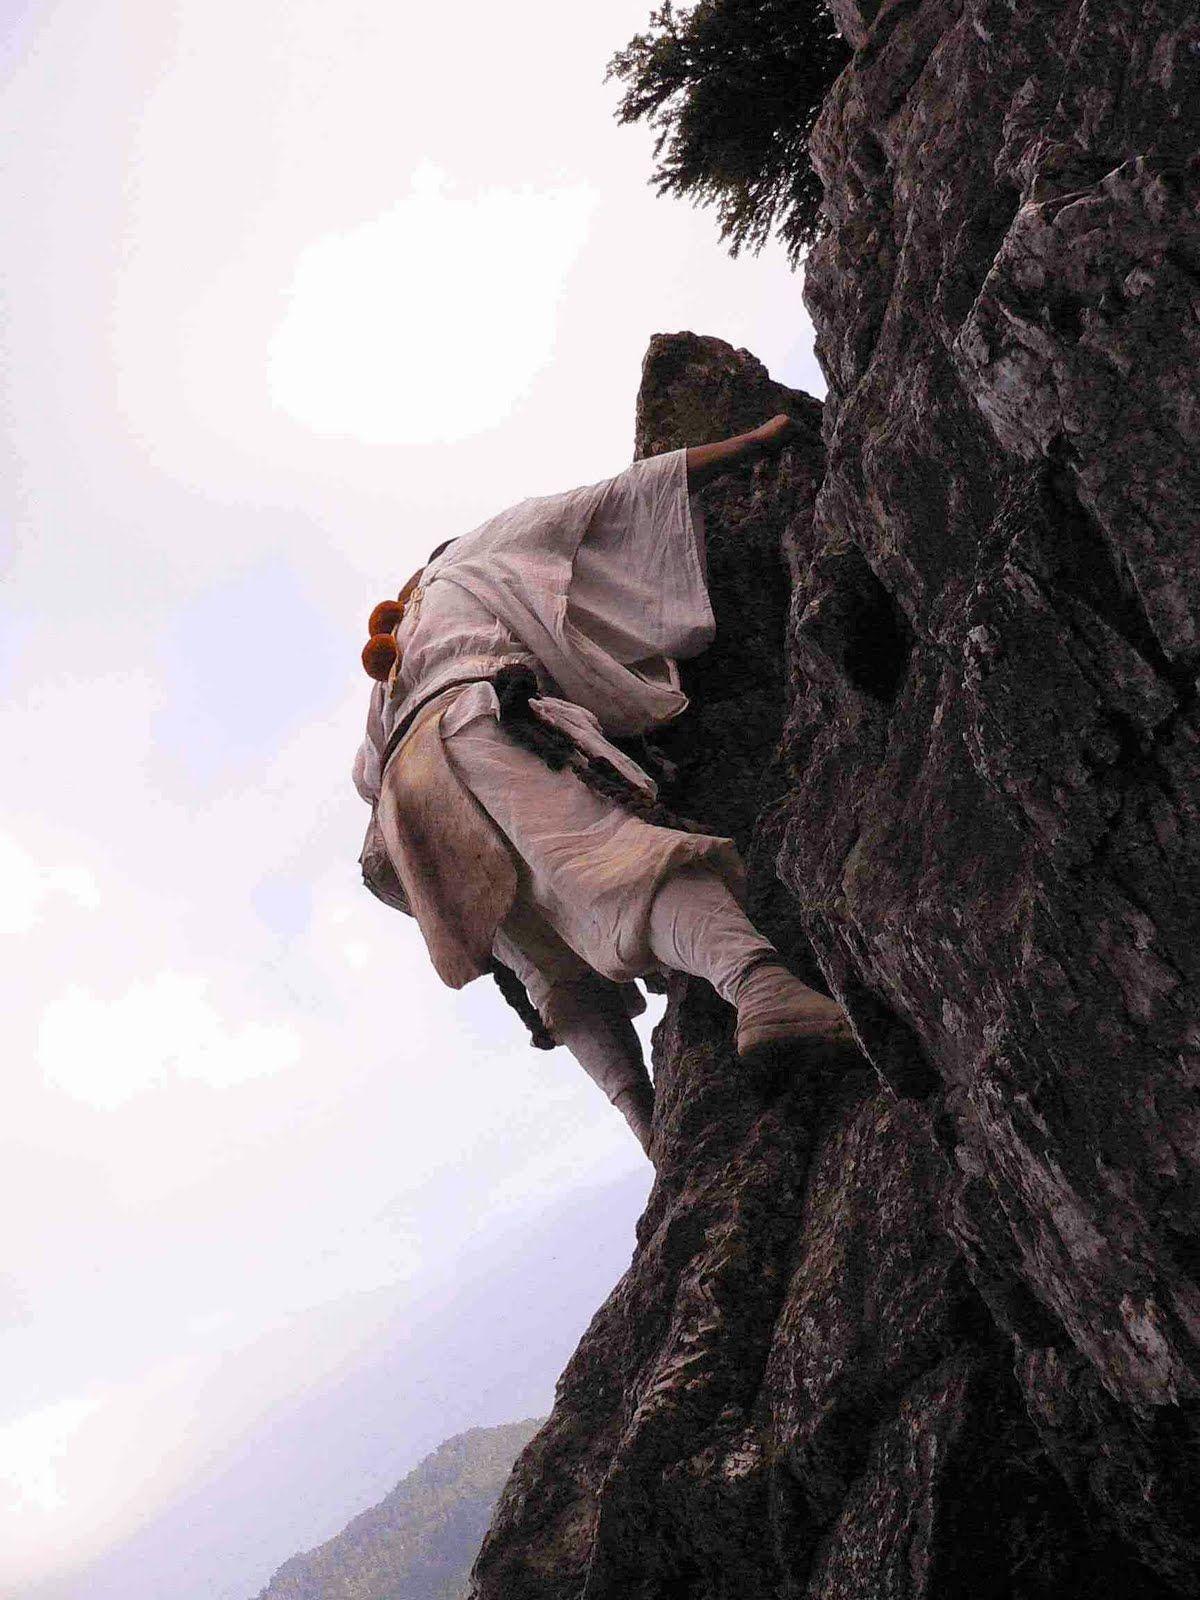 Yamabushi climbing the mountain